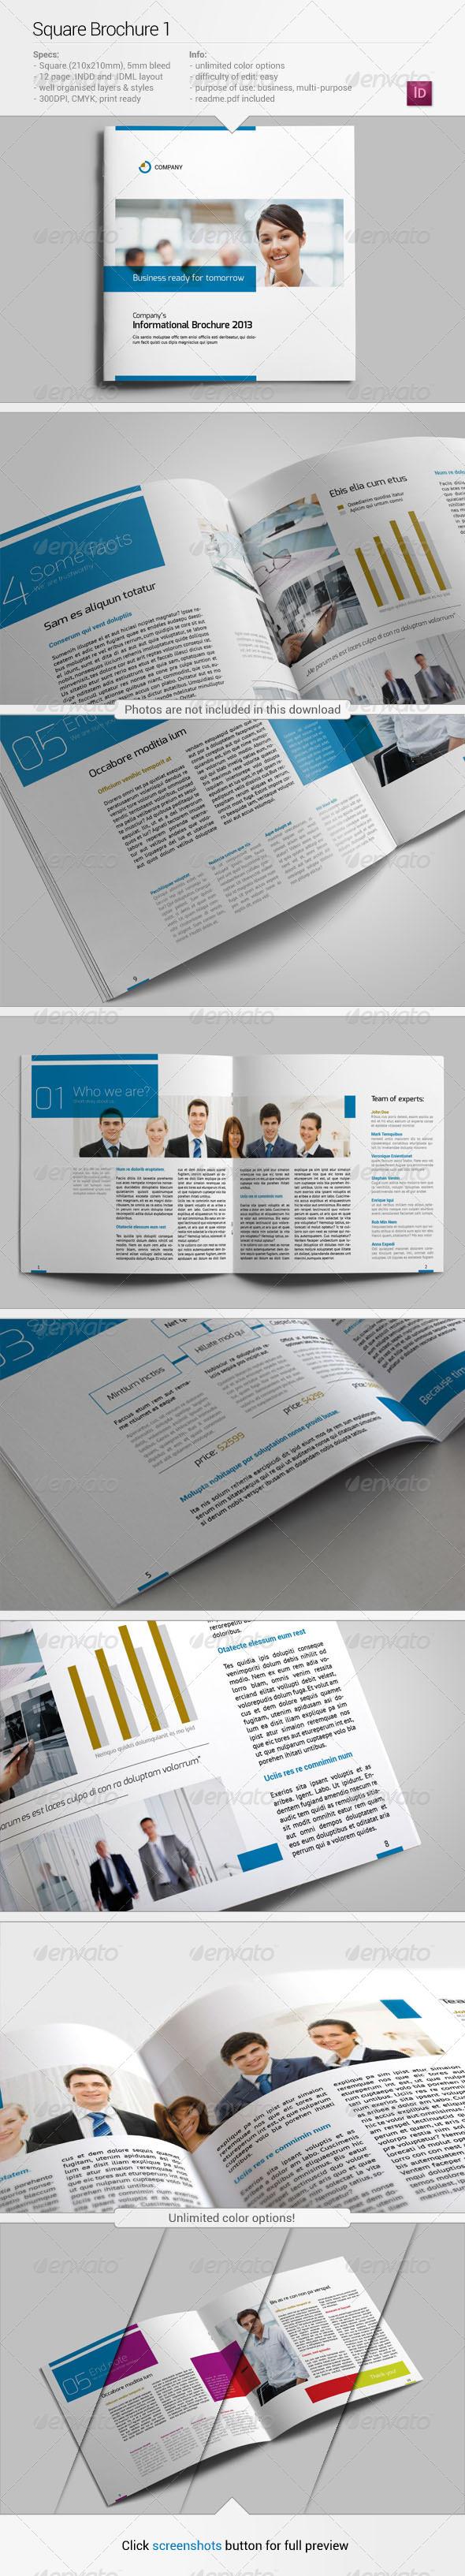 Square Brochure 1 - Corporate Brochures